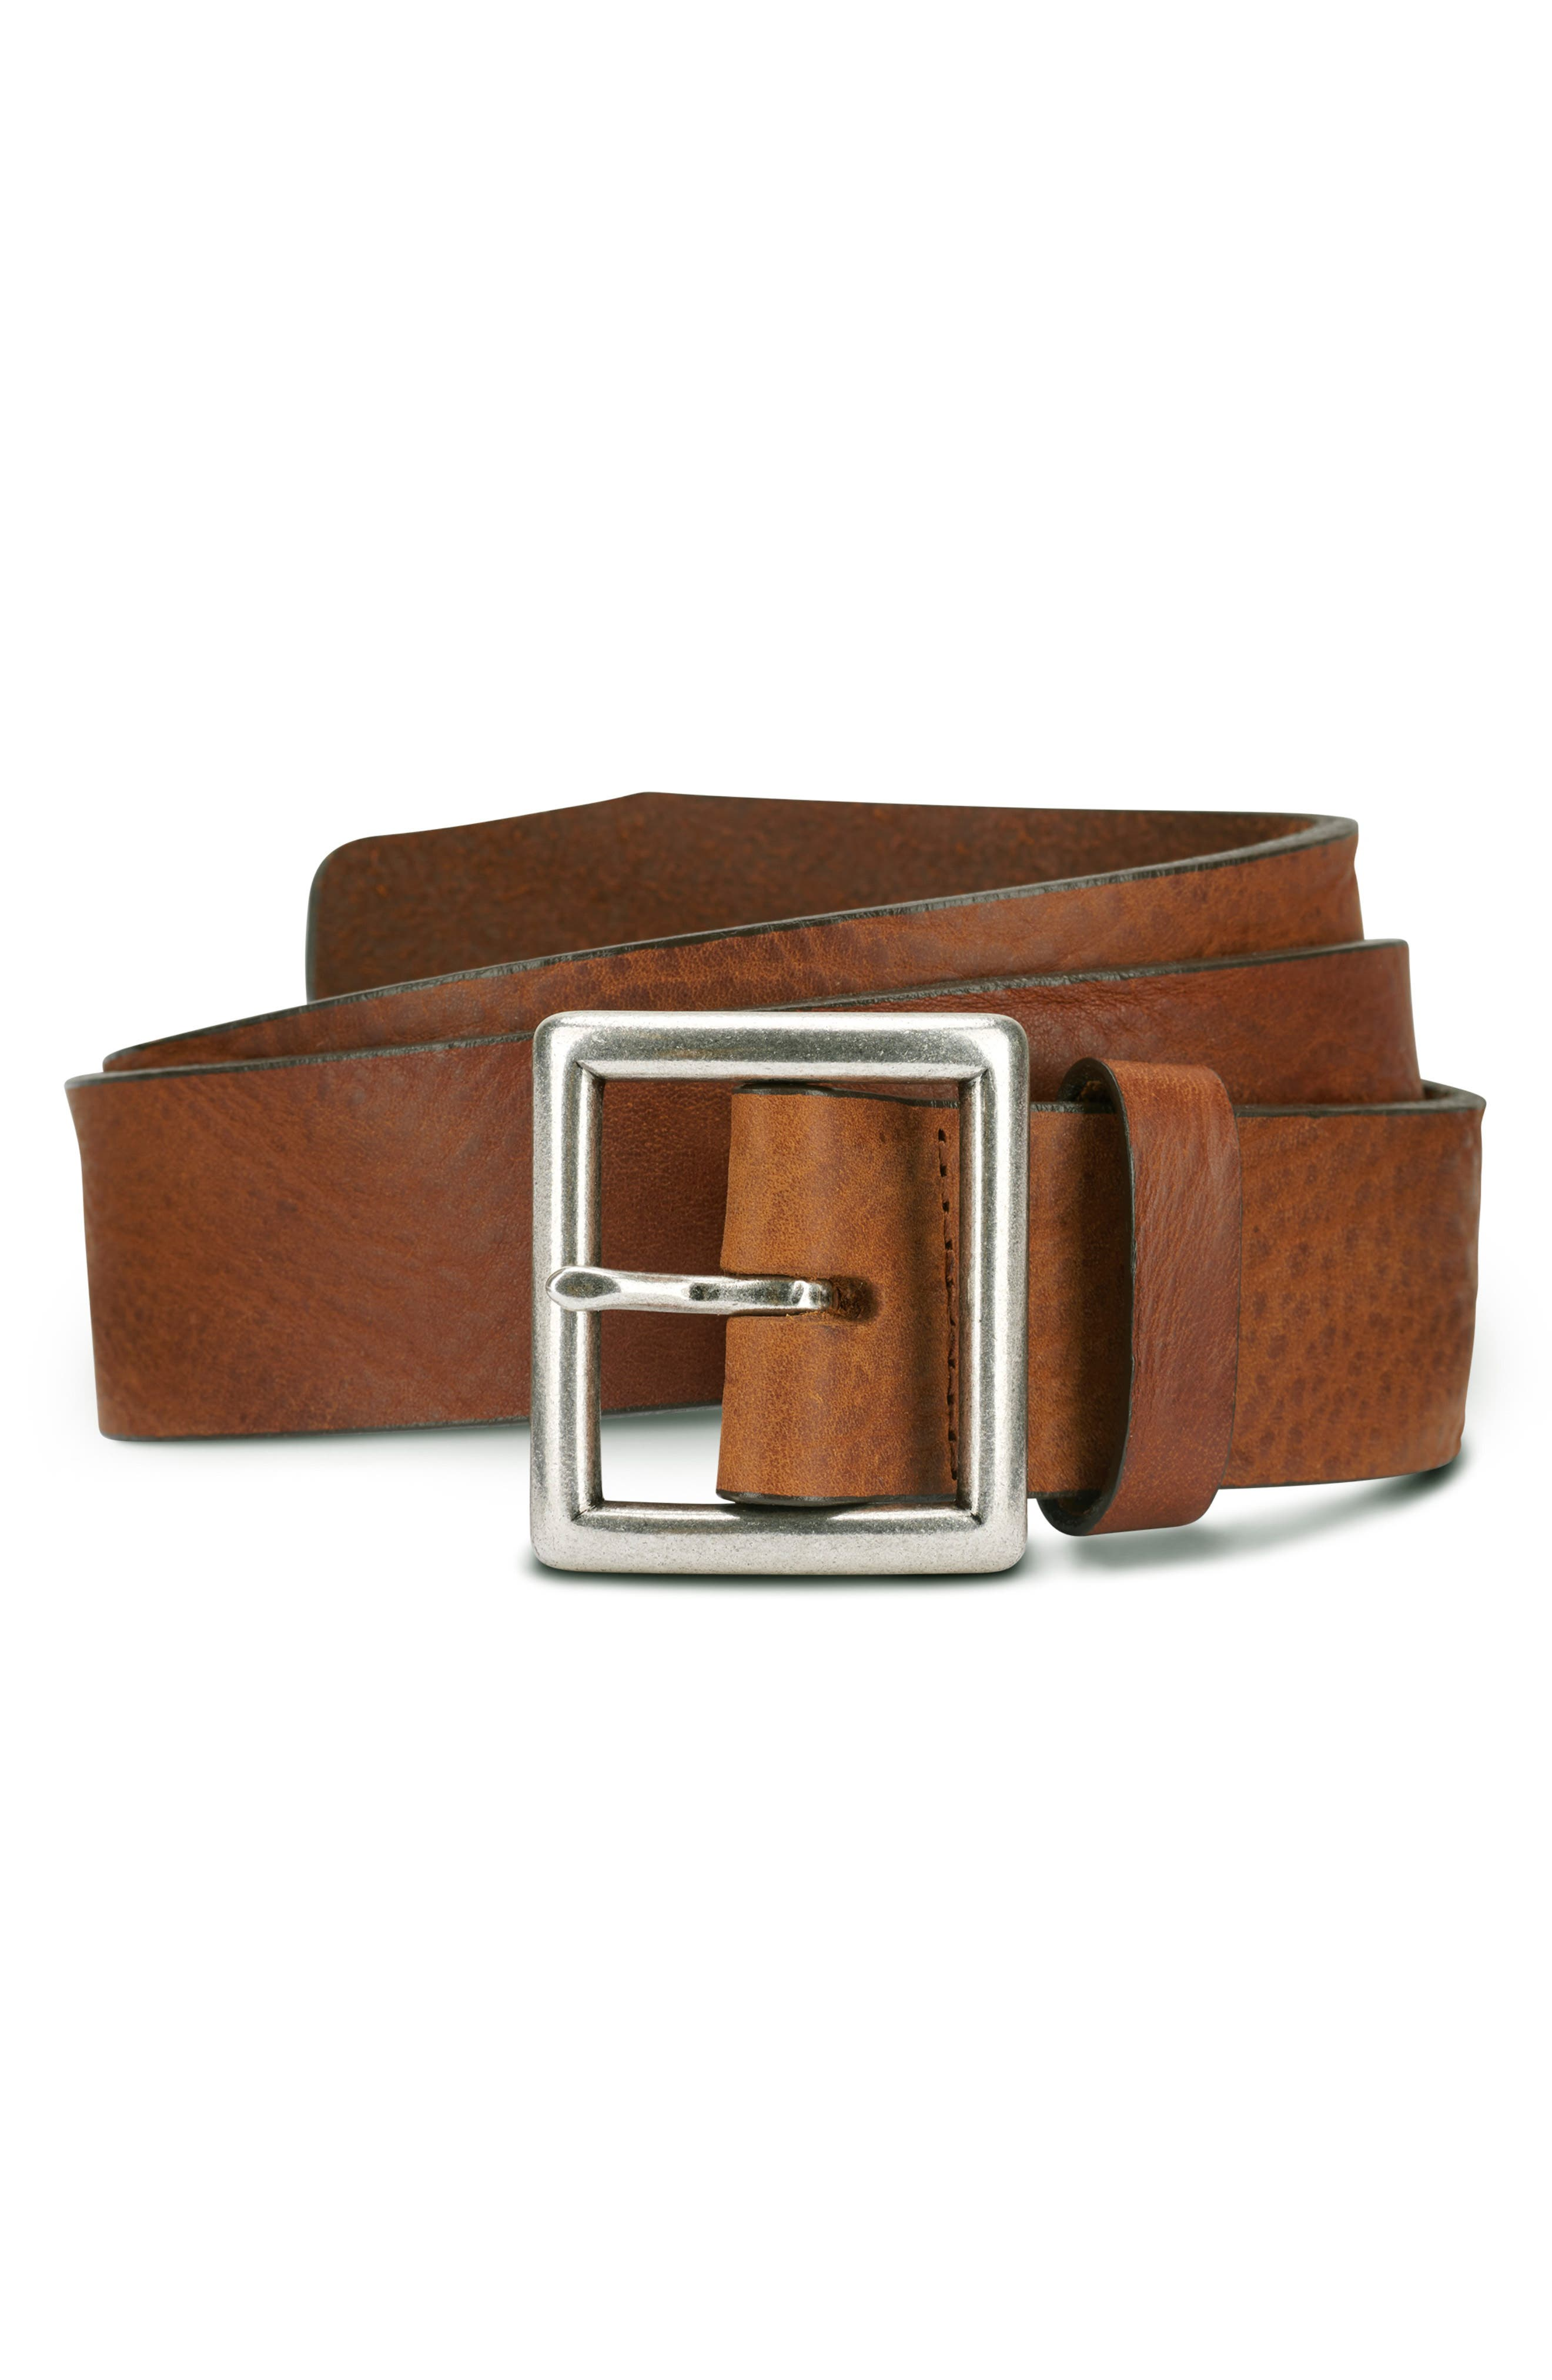 Allen Edmonds Radcliff Avenue Leather Belt, Brown